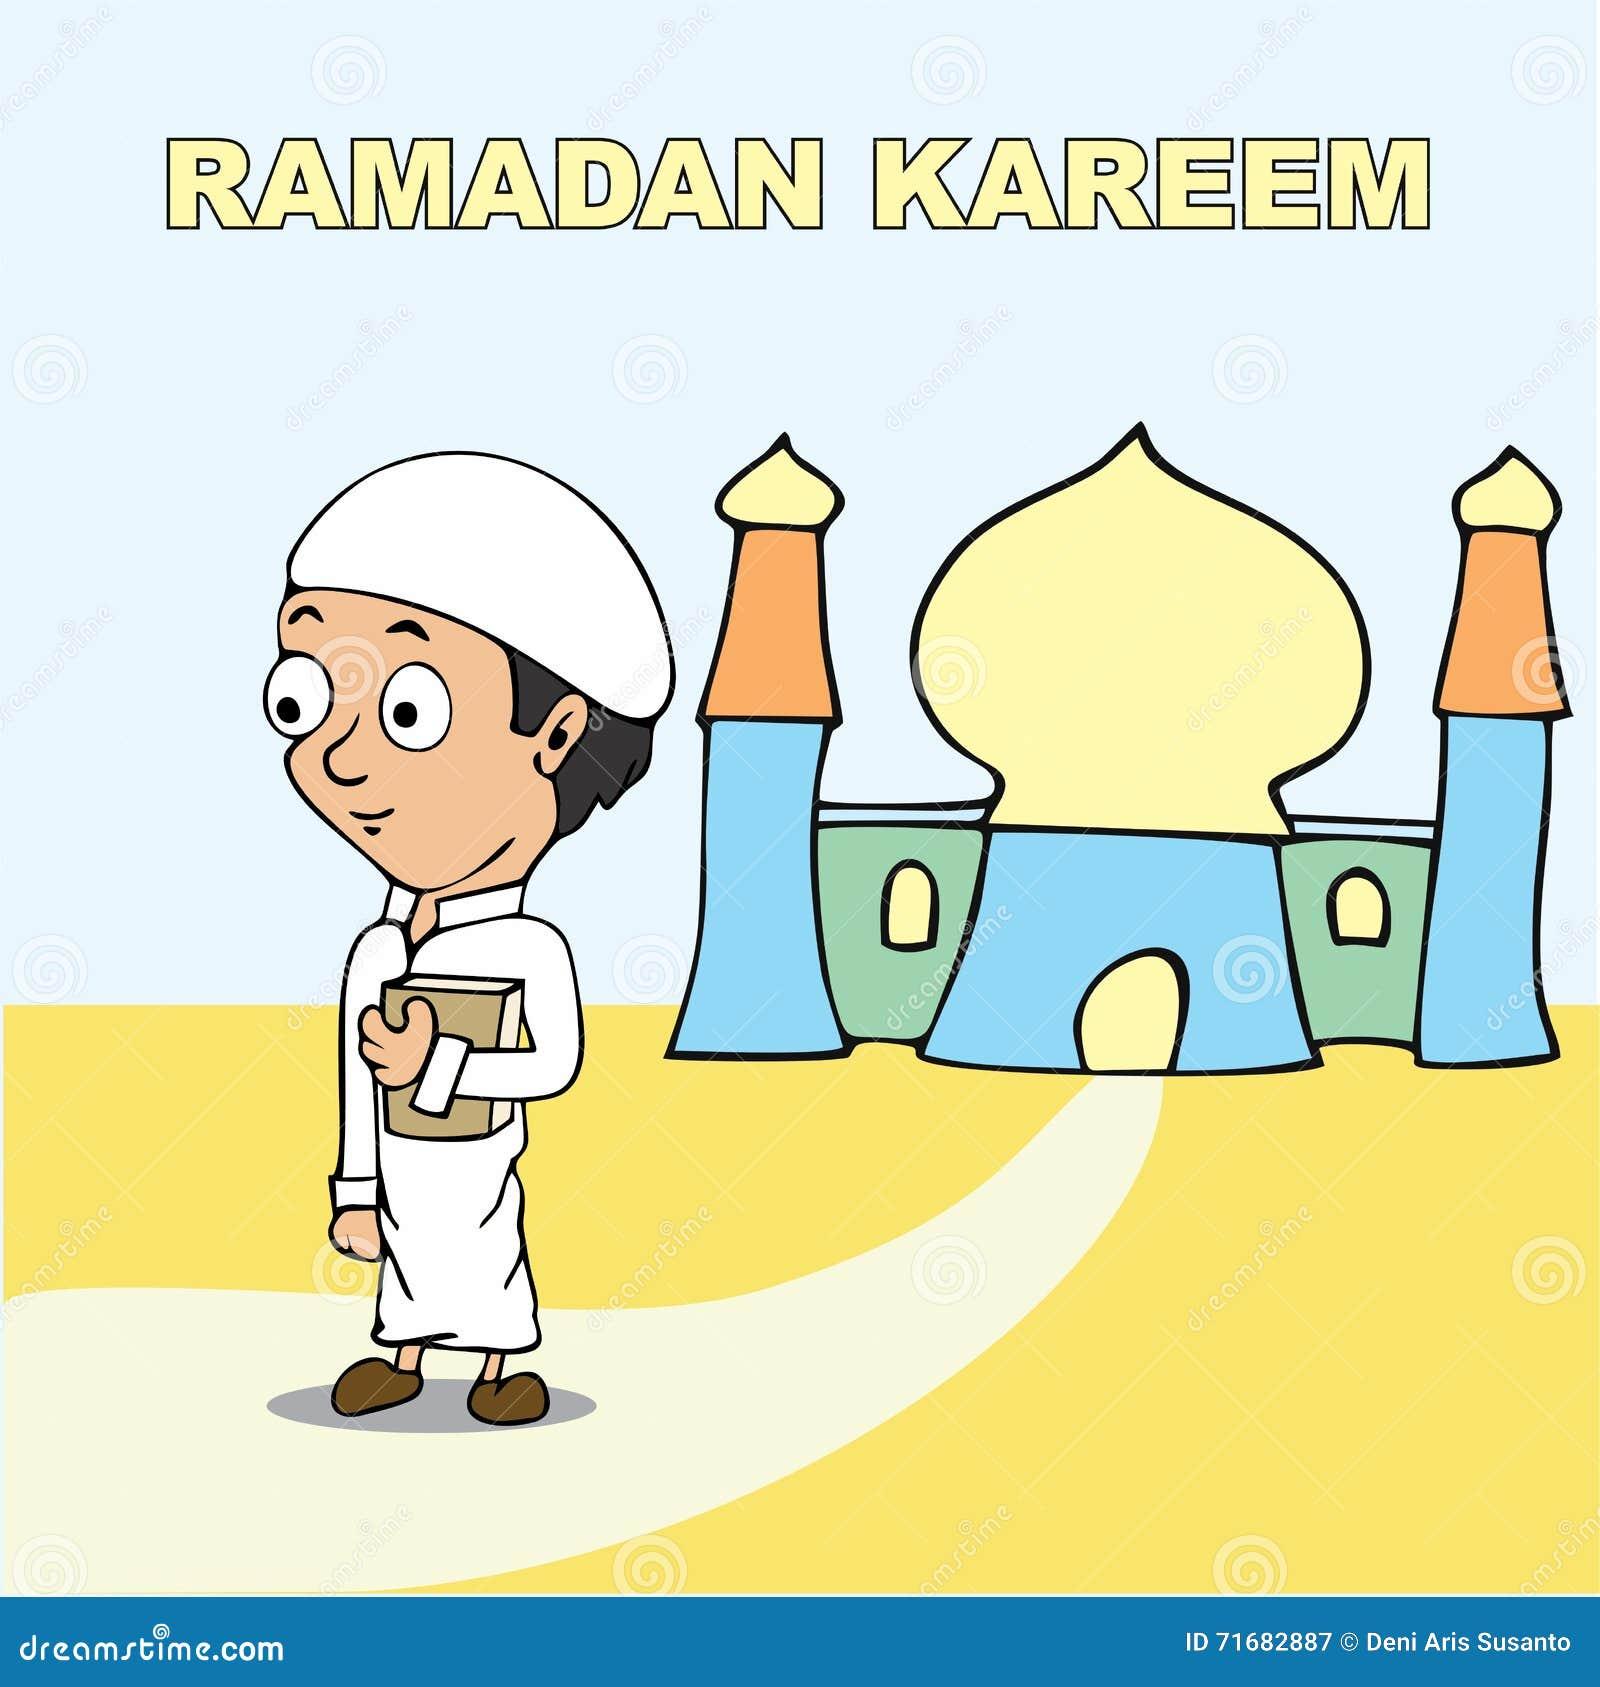 Ramadan kareem cartoon stock illustration. Illustration of ...